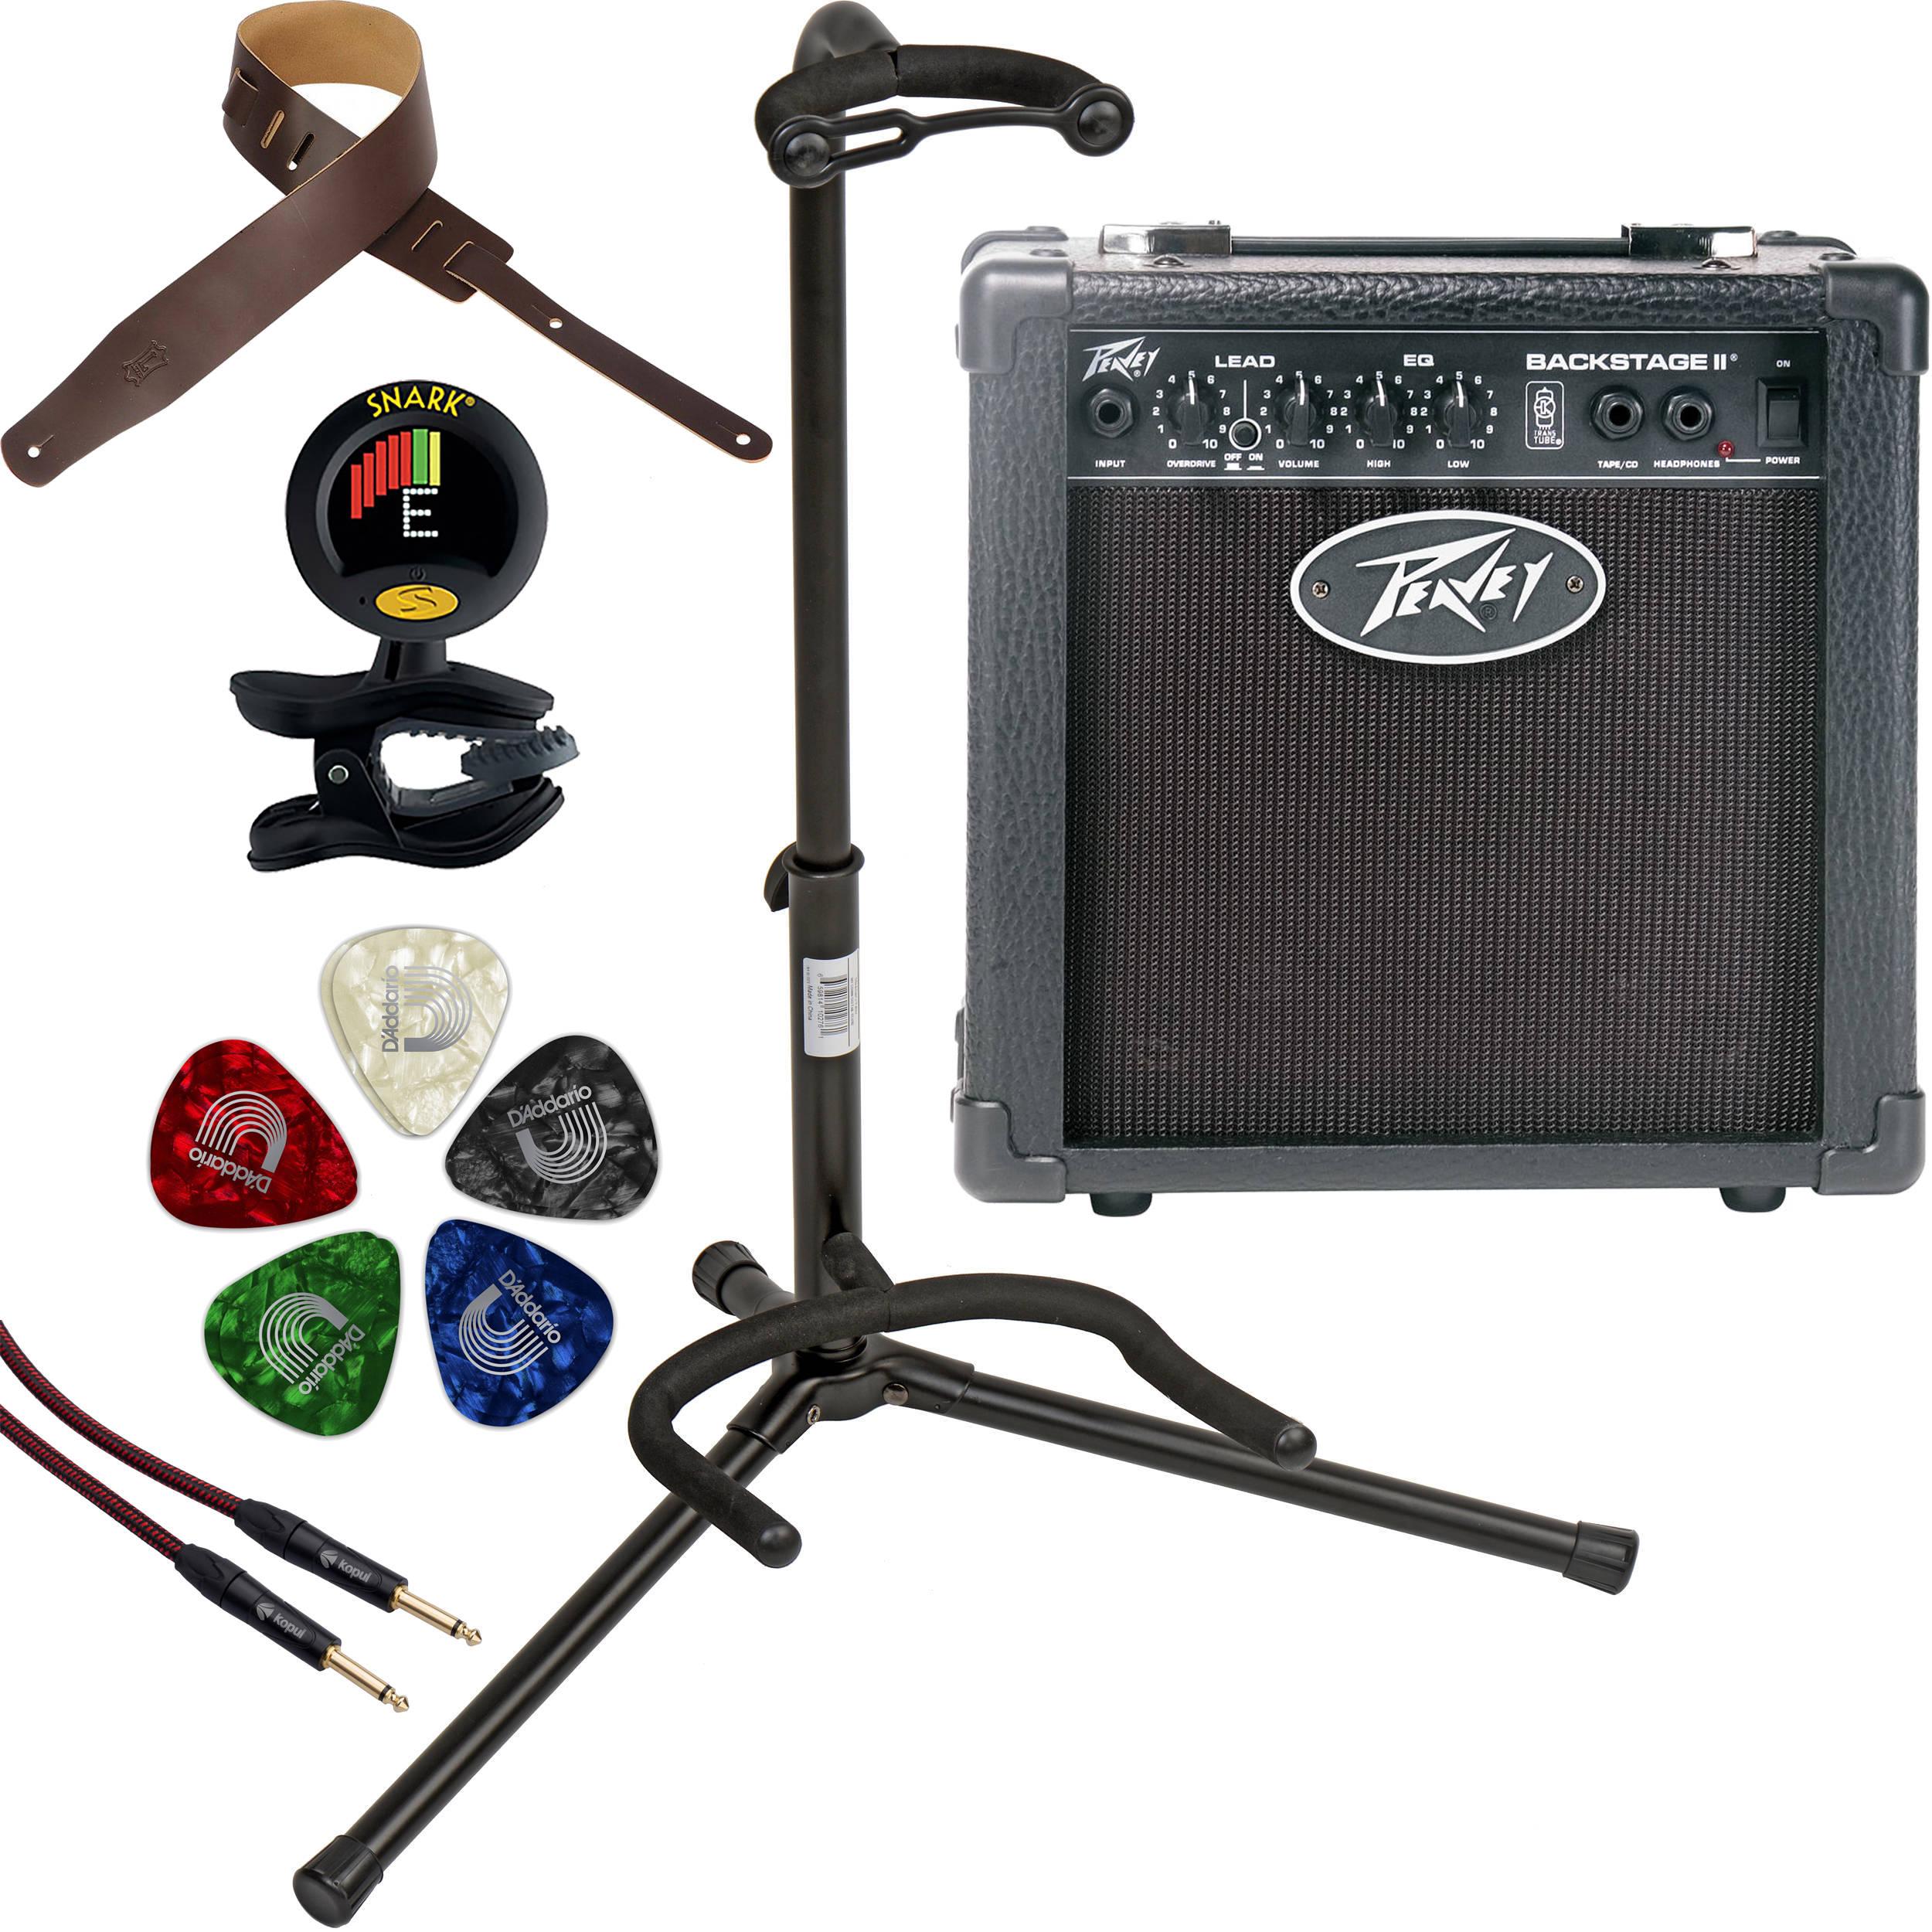 peavey backstage ii amp essentials for electric guitar b h. Black Bedroom Furniture Sets. Home Design Ideas